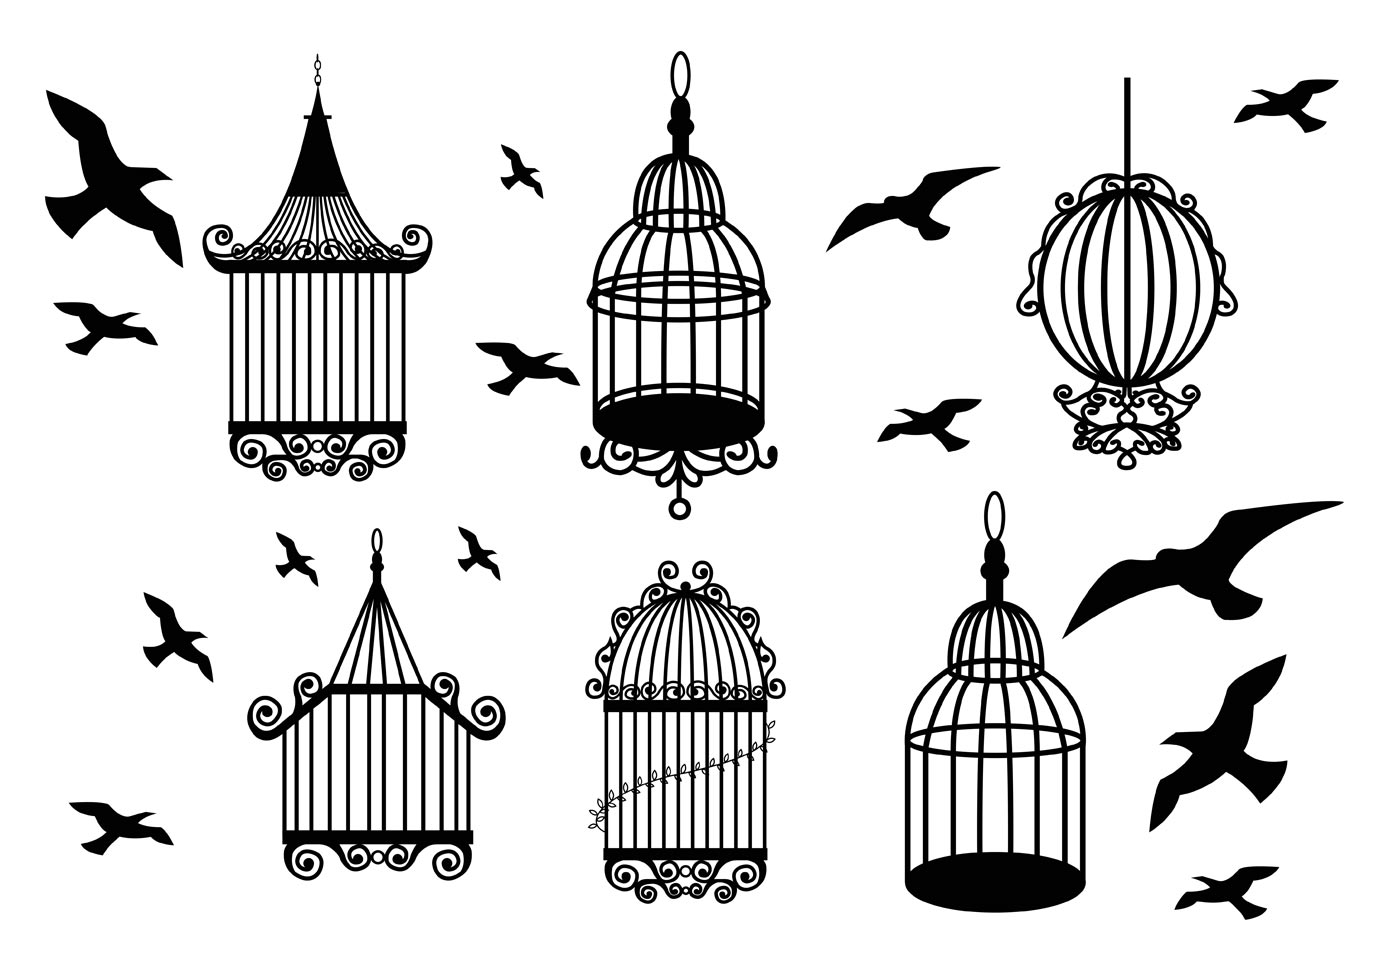 Open Birdcage Silhouette Vintage Bird Cage